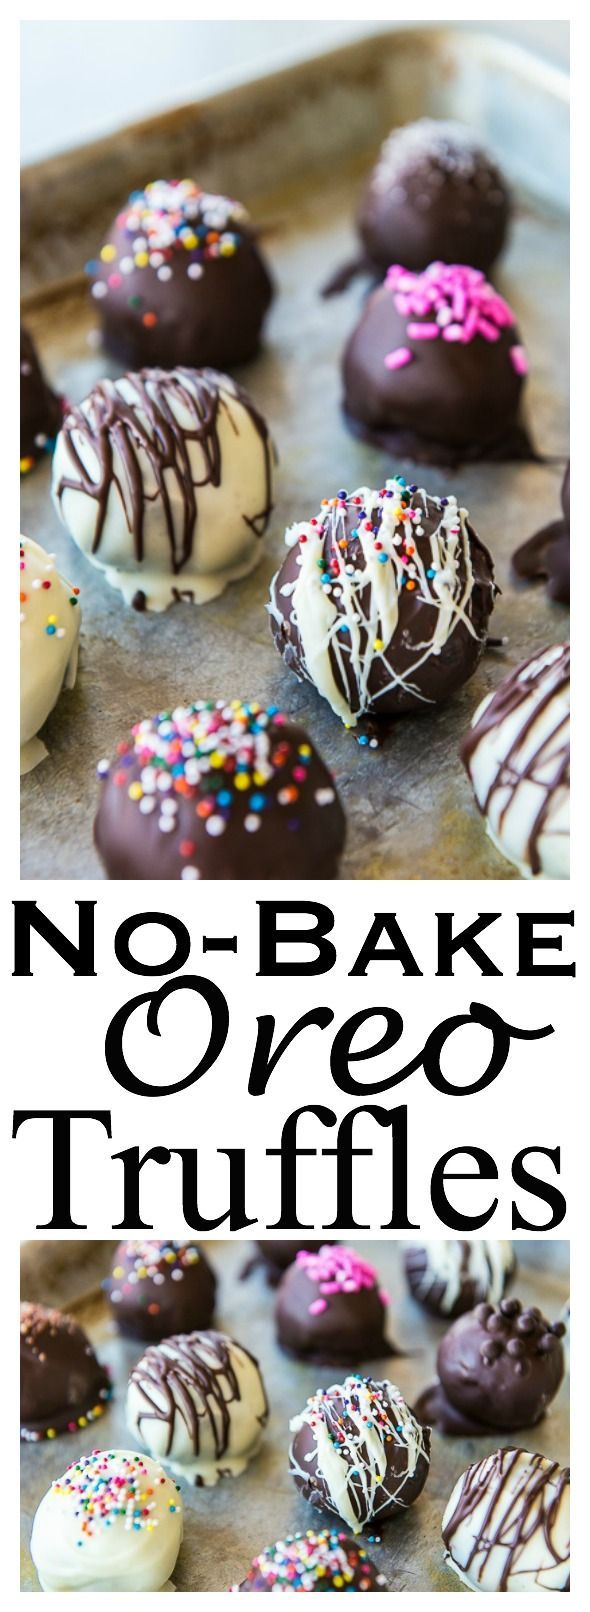 Easy No-bake Oreo Truffles Recipe - Great Food Gift (Chocolate Cheesecake No Bake)